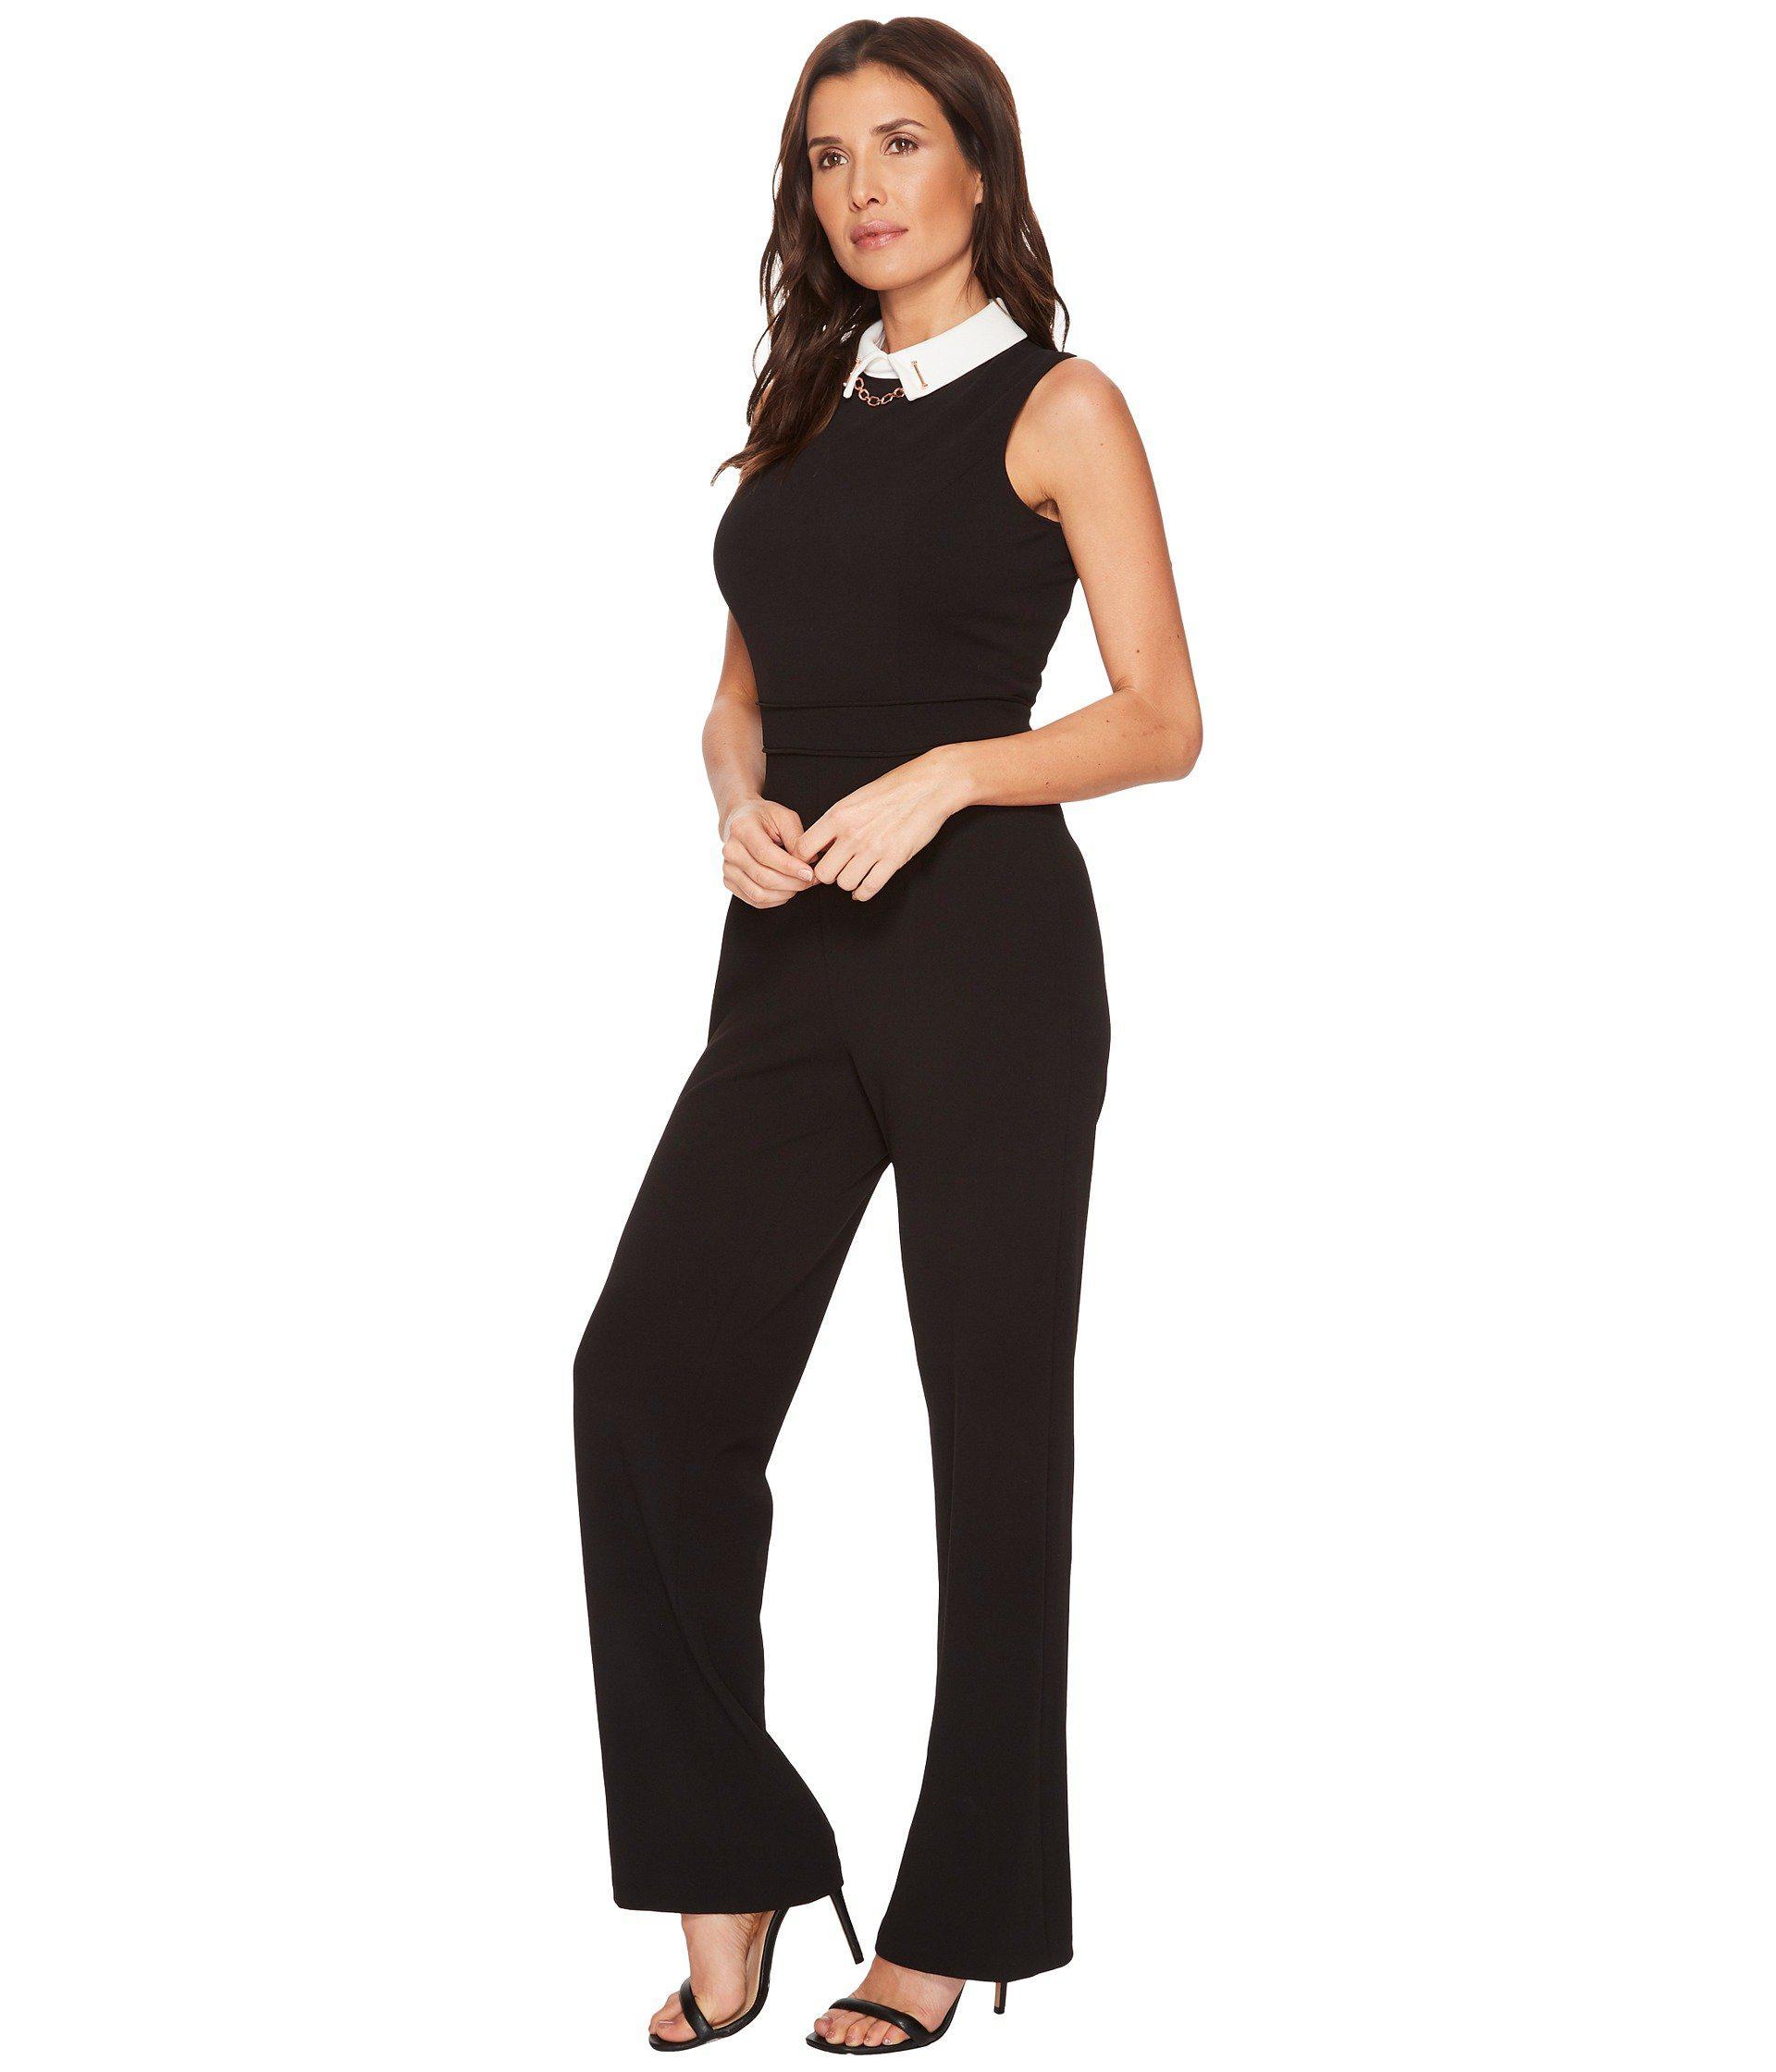 ec6d01148d0 Lyst - Ivanka Trump Scuba Crepe White Collar Jumpsuit in Black - Save 46%